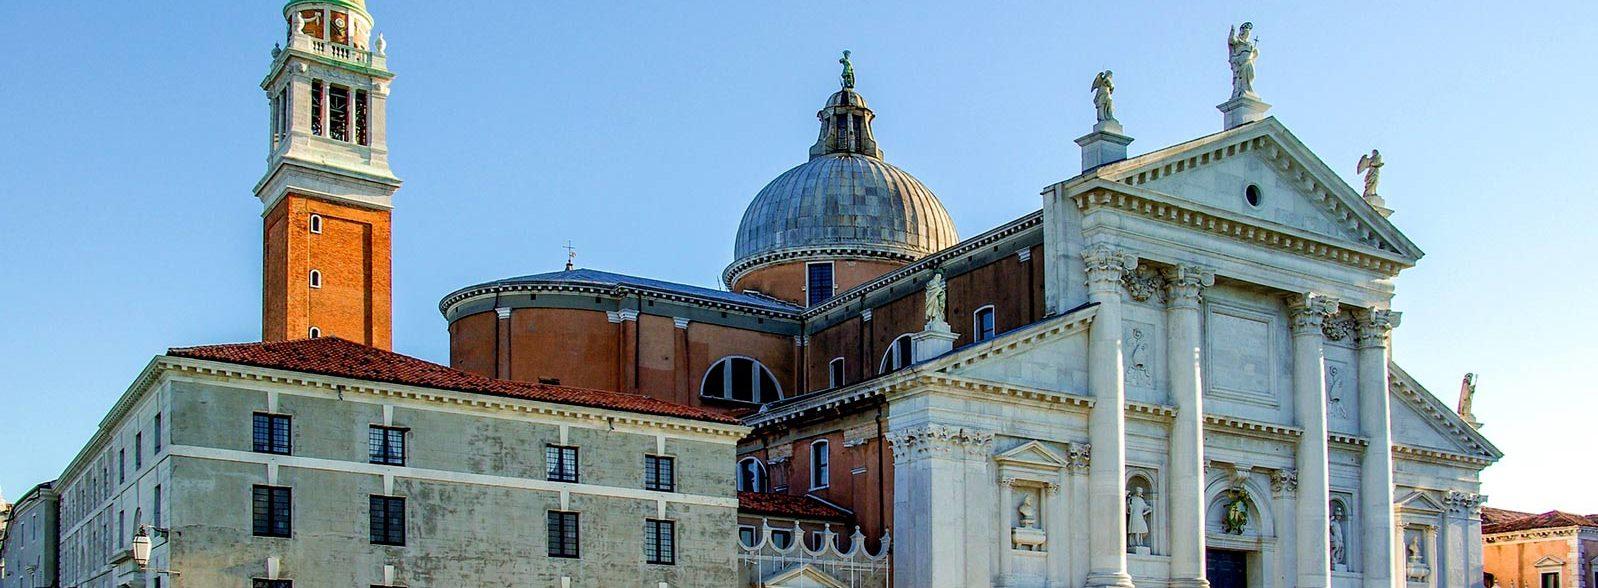 Giudecca island in Venice:  top things to see